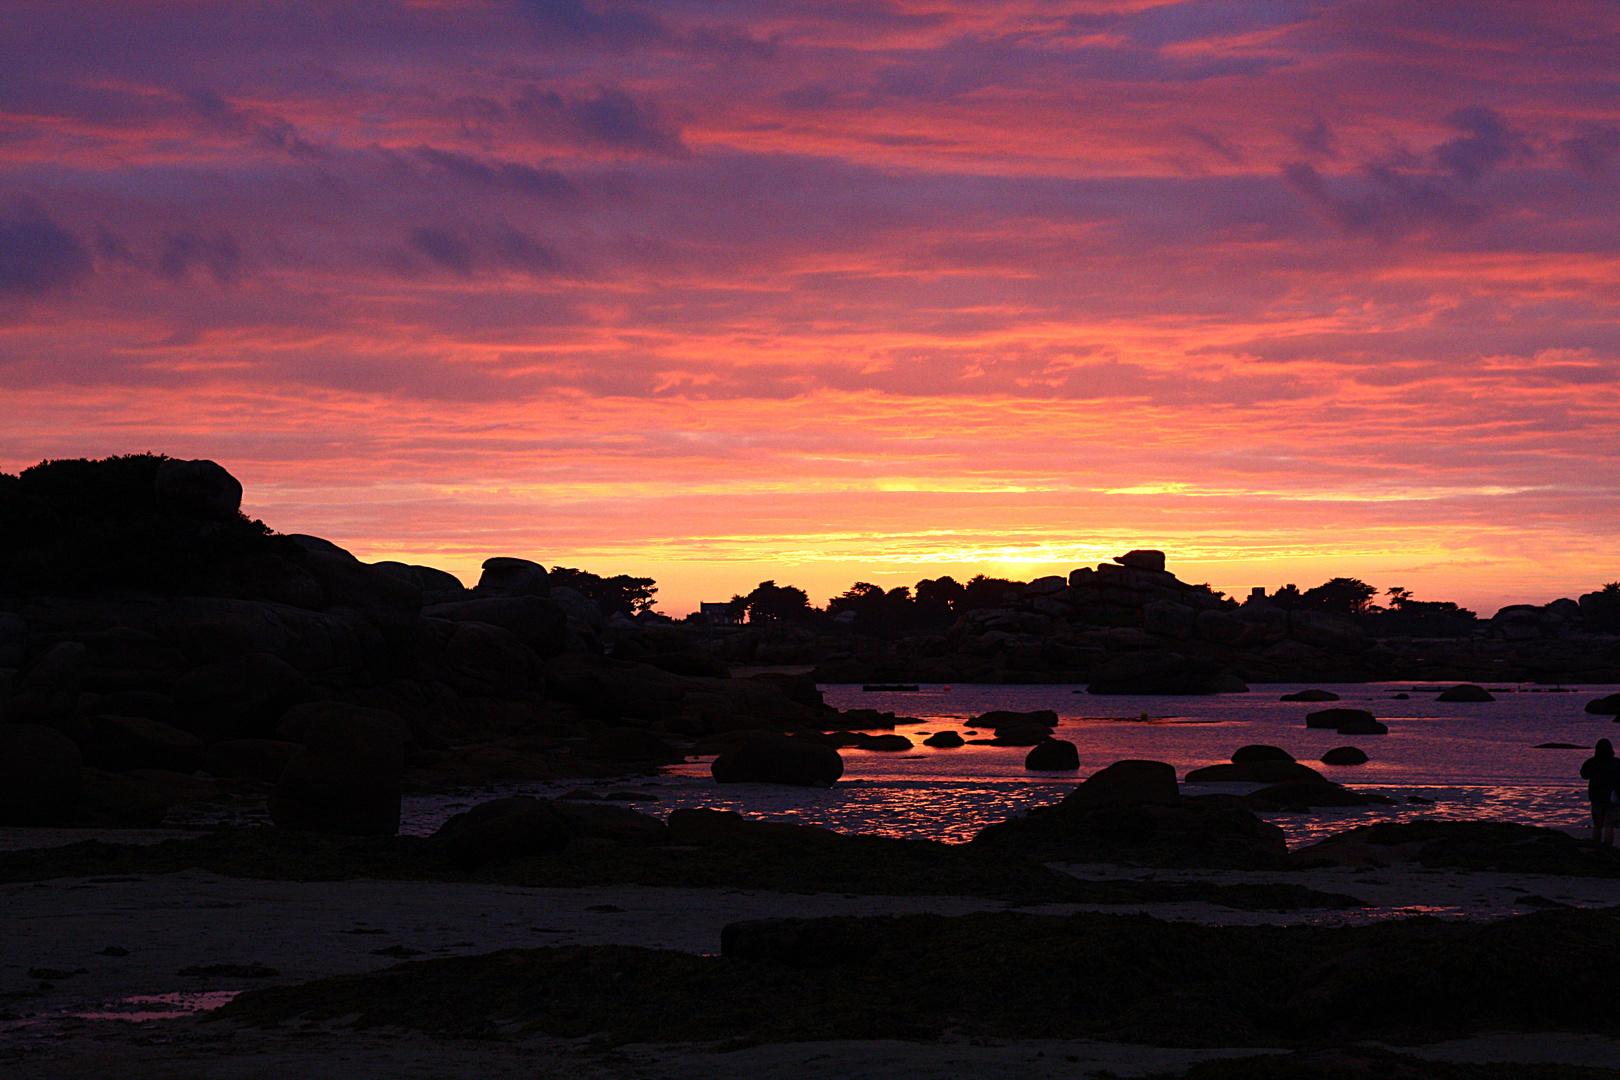 Sonnenuntergang am Atlantik (2)